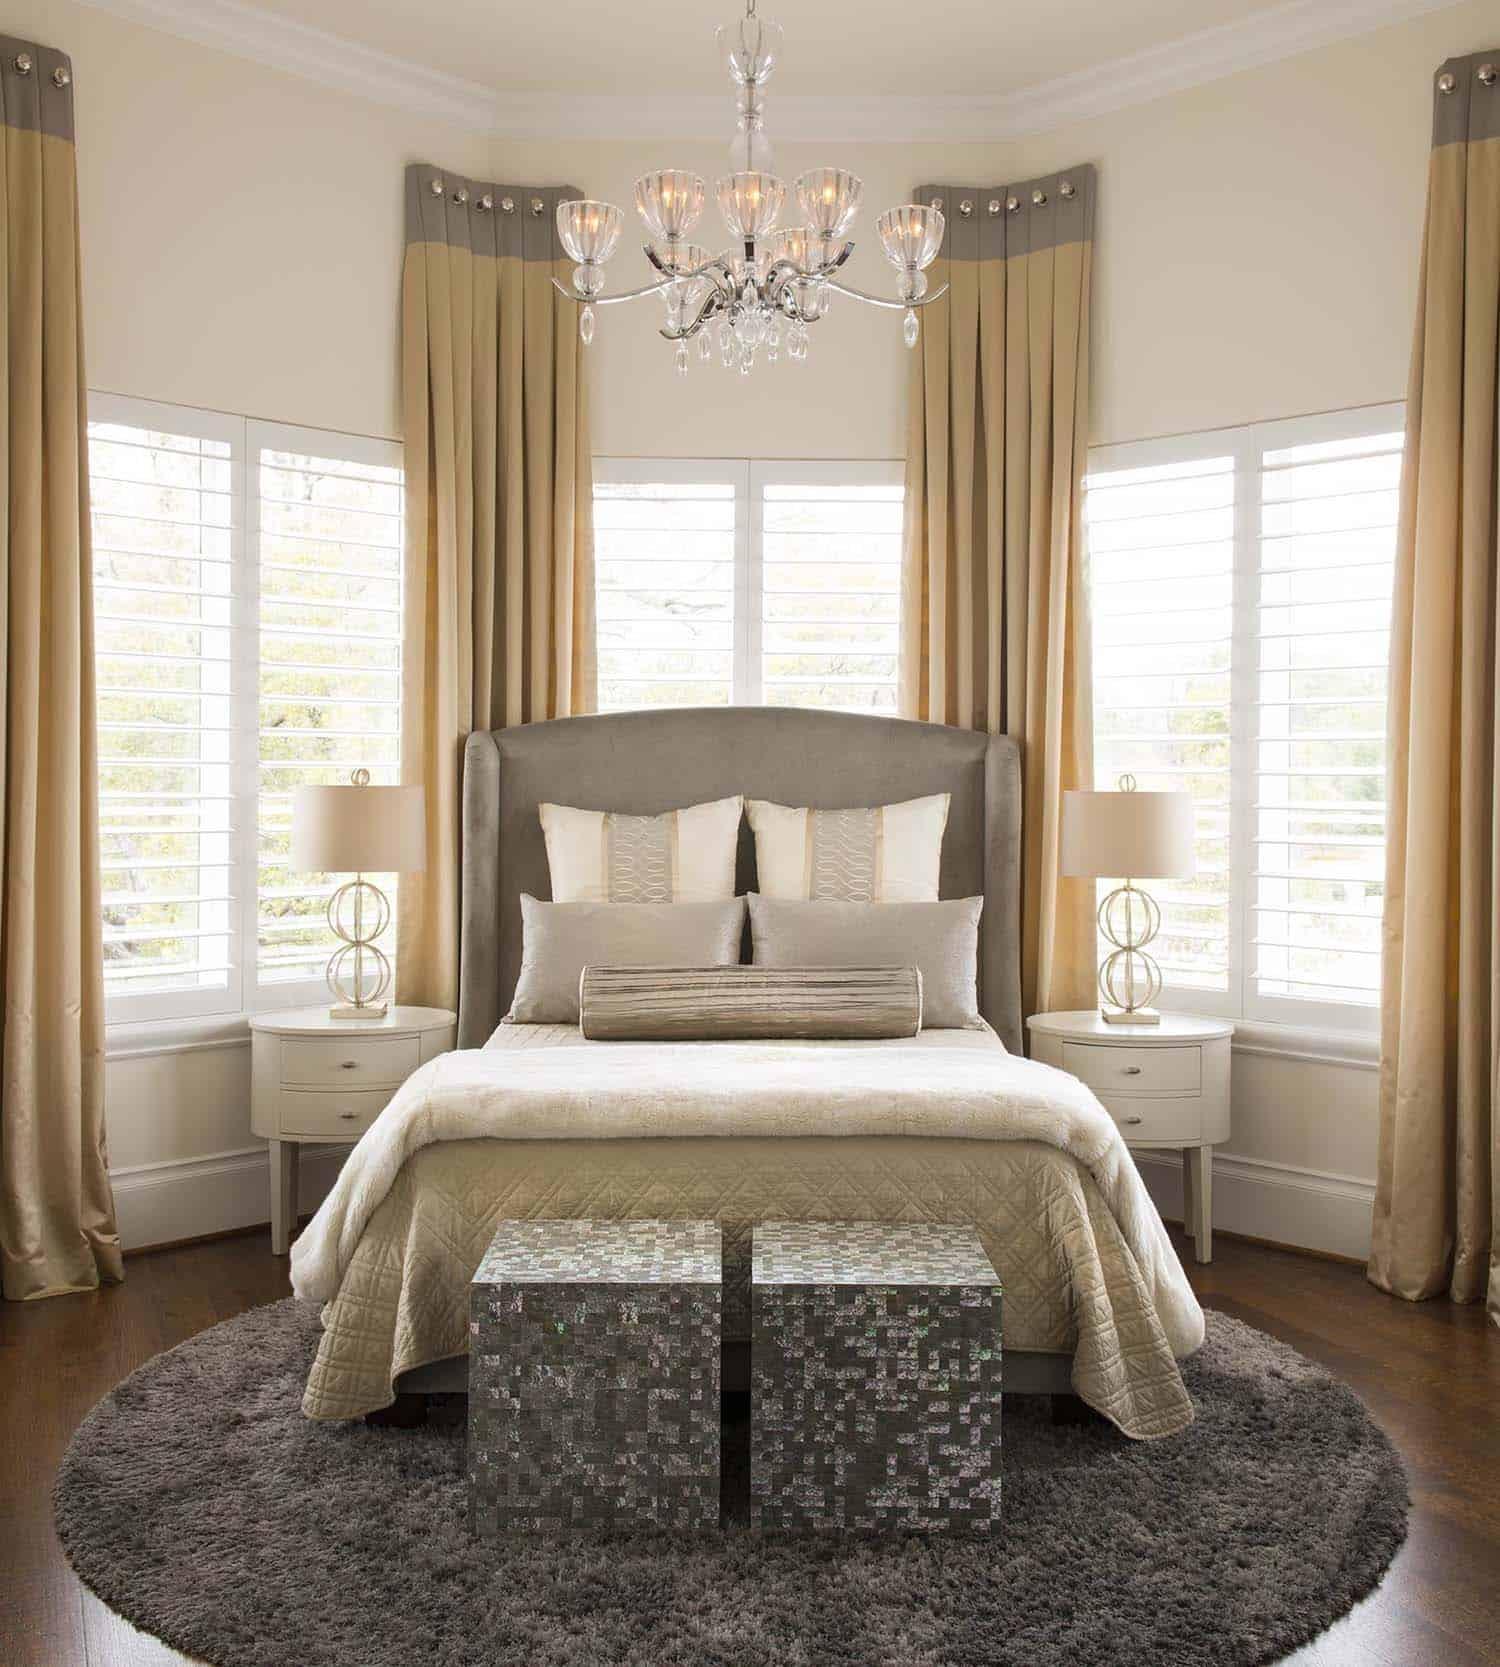 Contemporary Style Home-Dallas Design Group-25-1 Kindesign